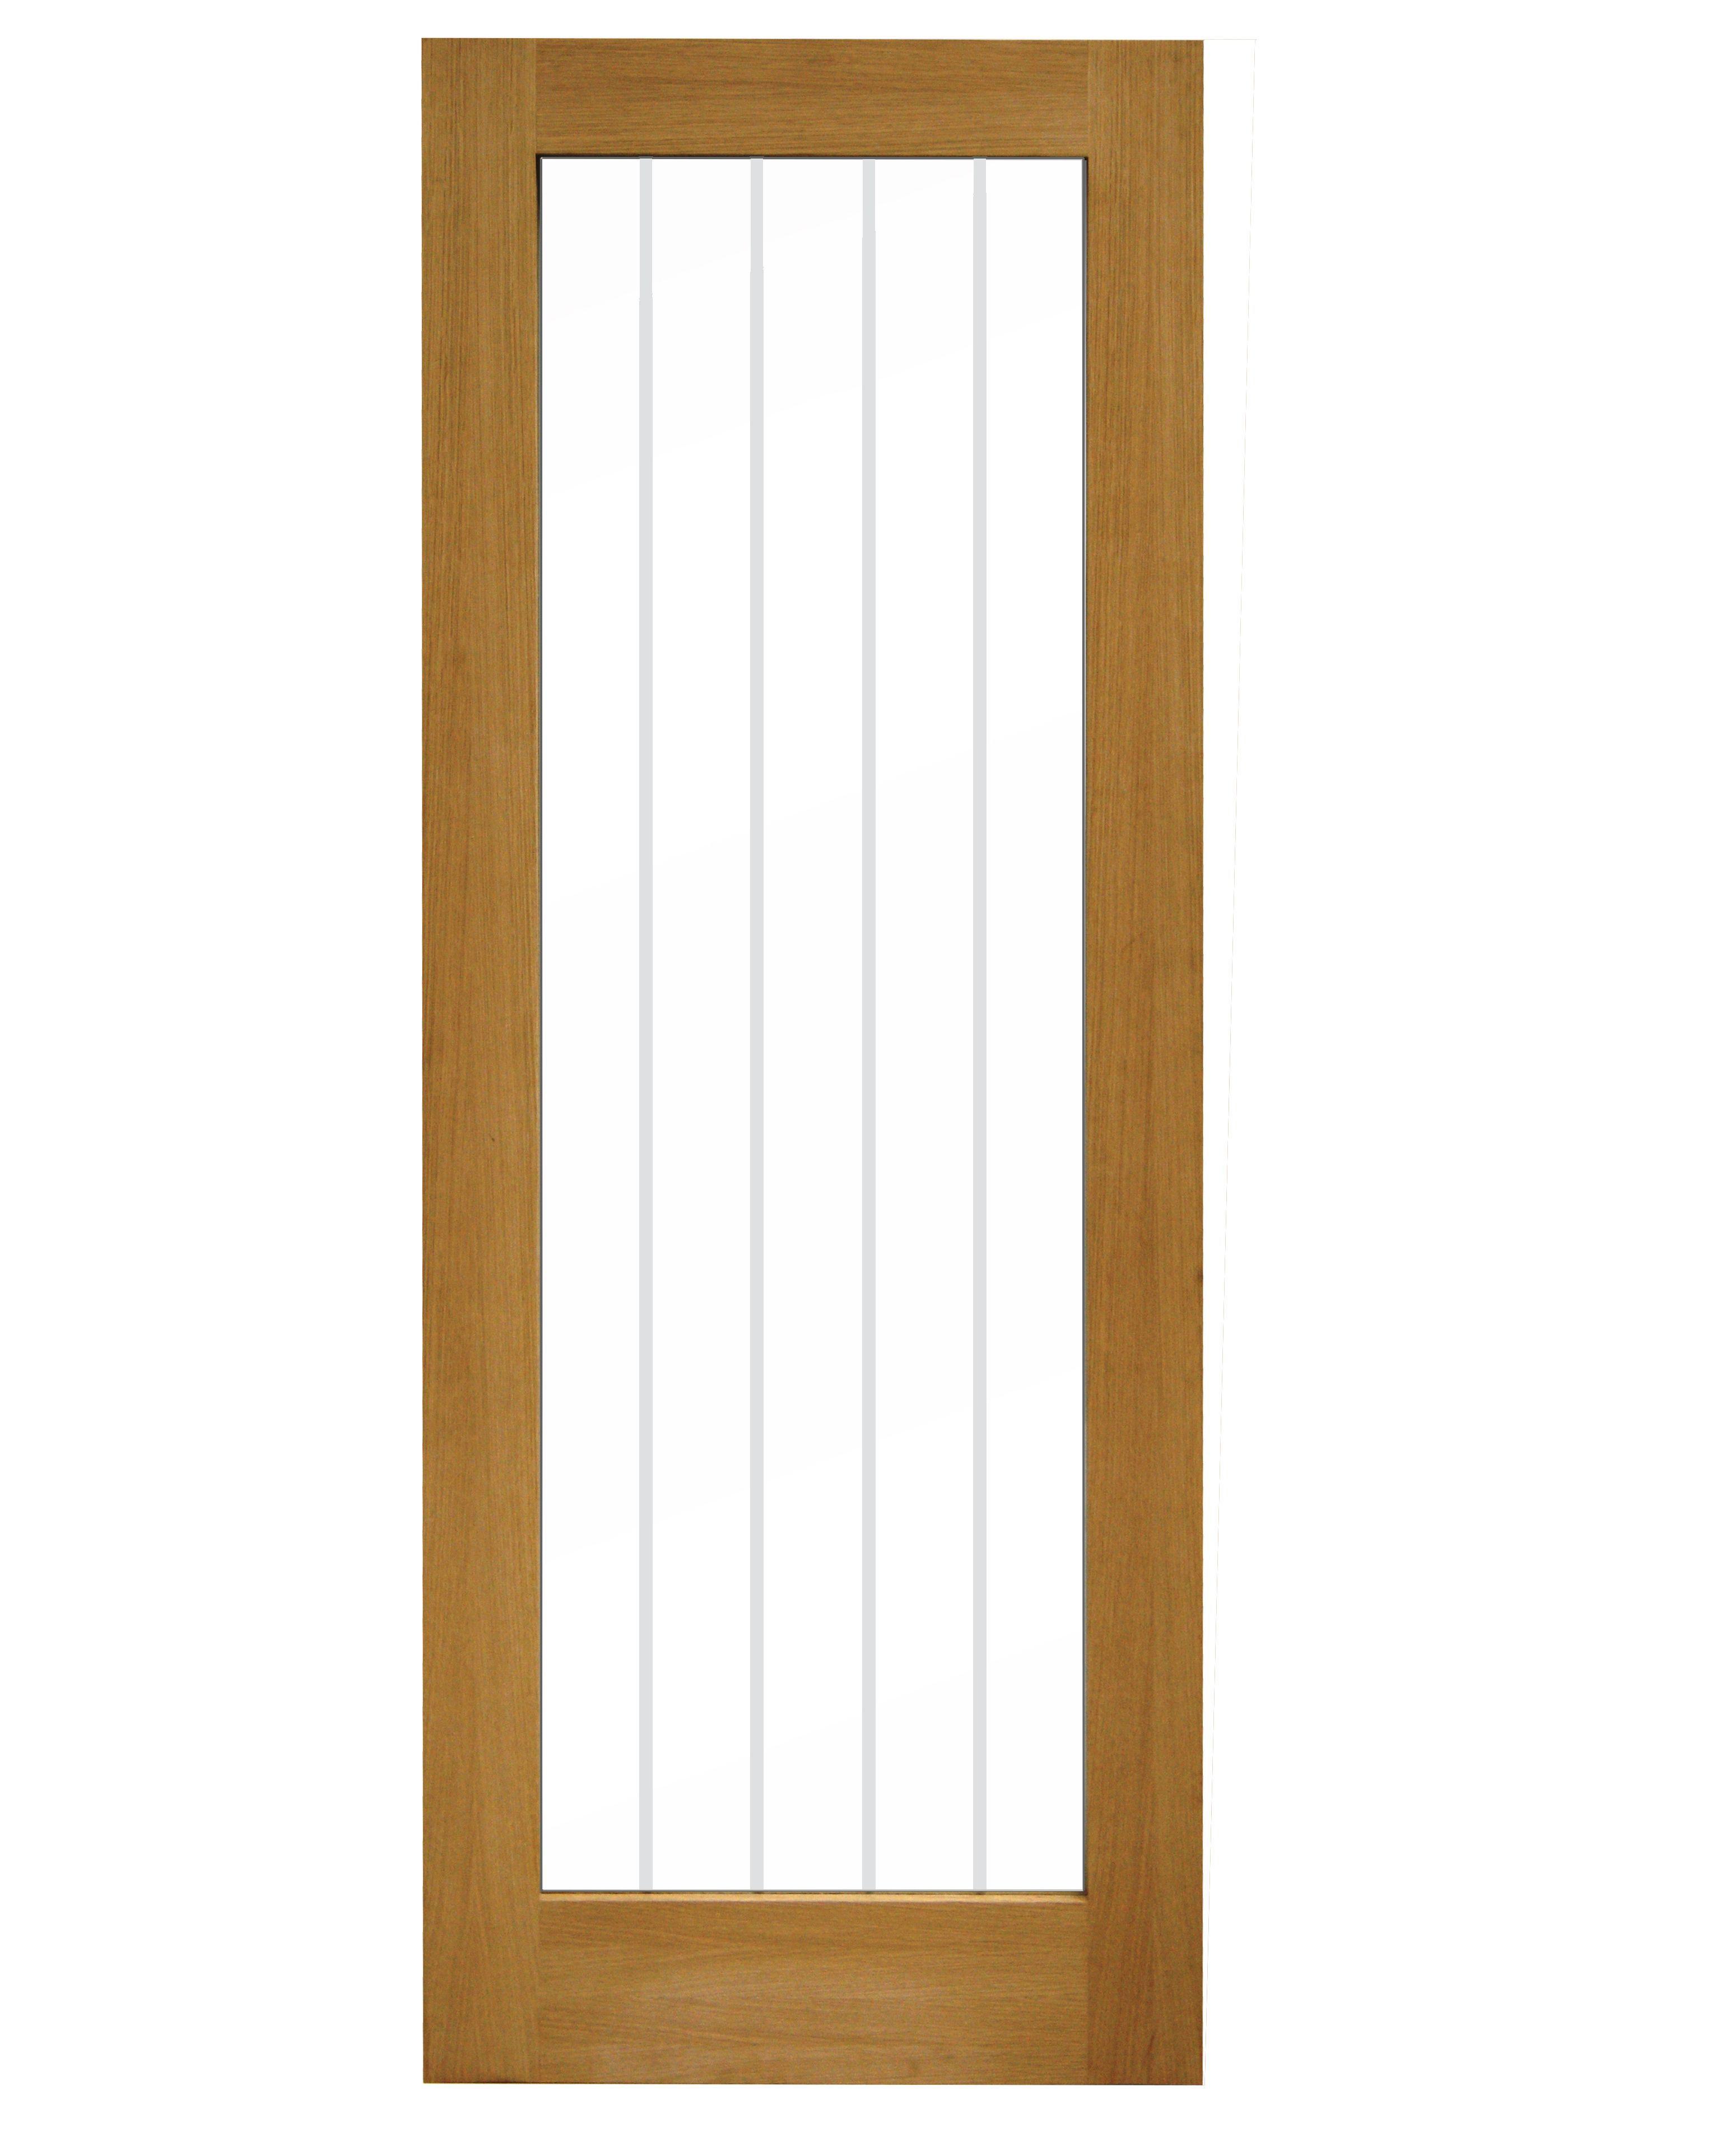 Cottage Panel 1 Lite Veneer Smooth Glazed Internal Standard Timber Door, (h)1981mm (w)762mm